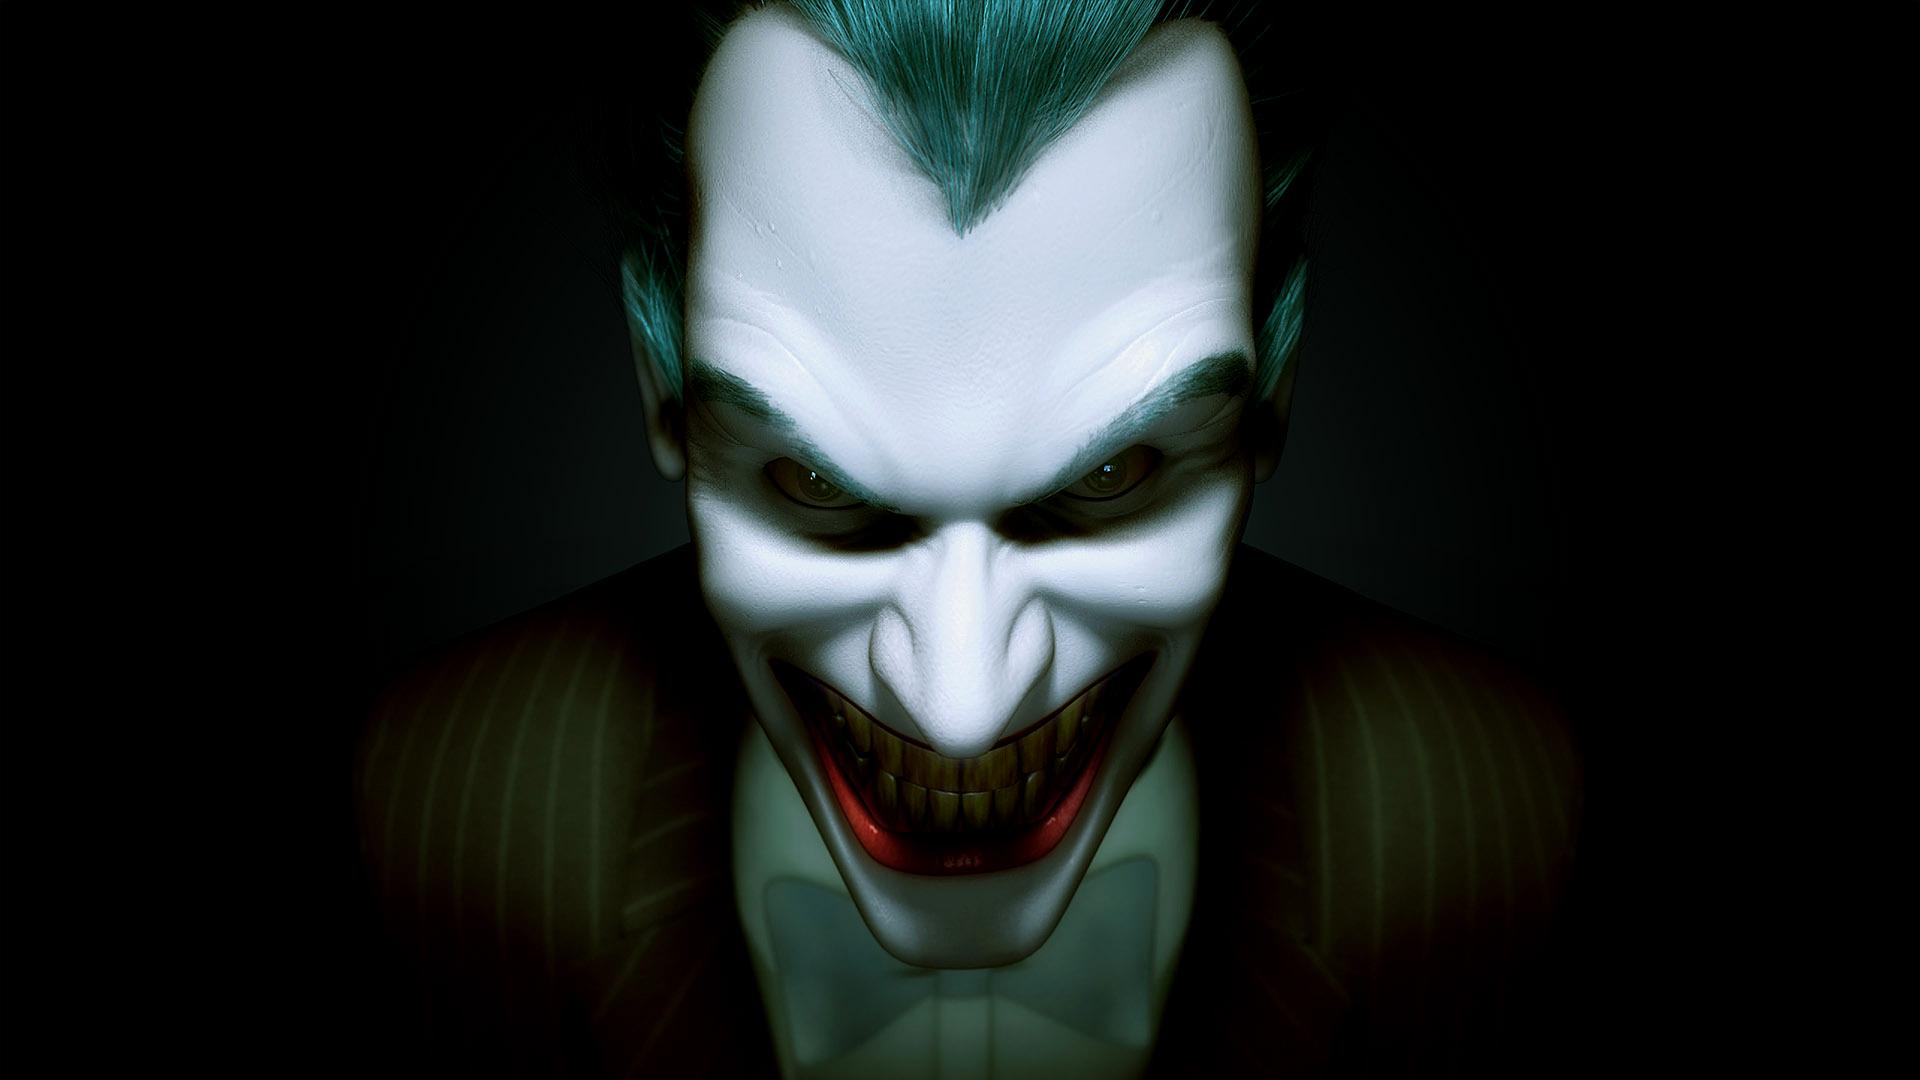 42 Joker Wallpaper Hd Windows 10 On Wallpapersafari